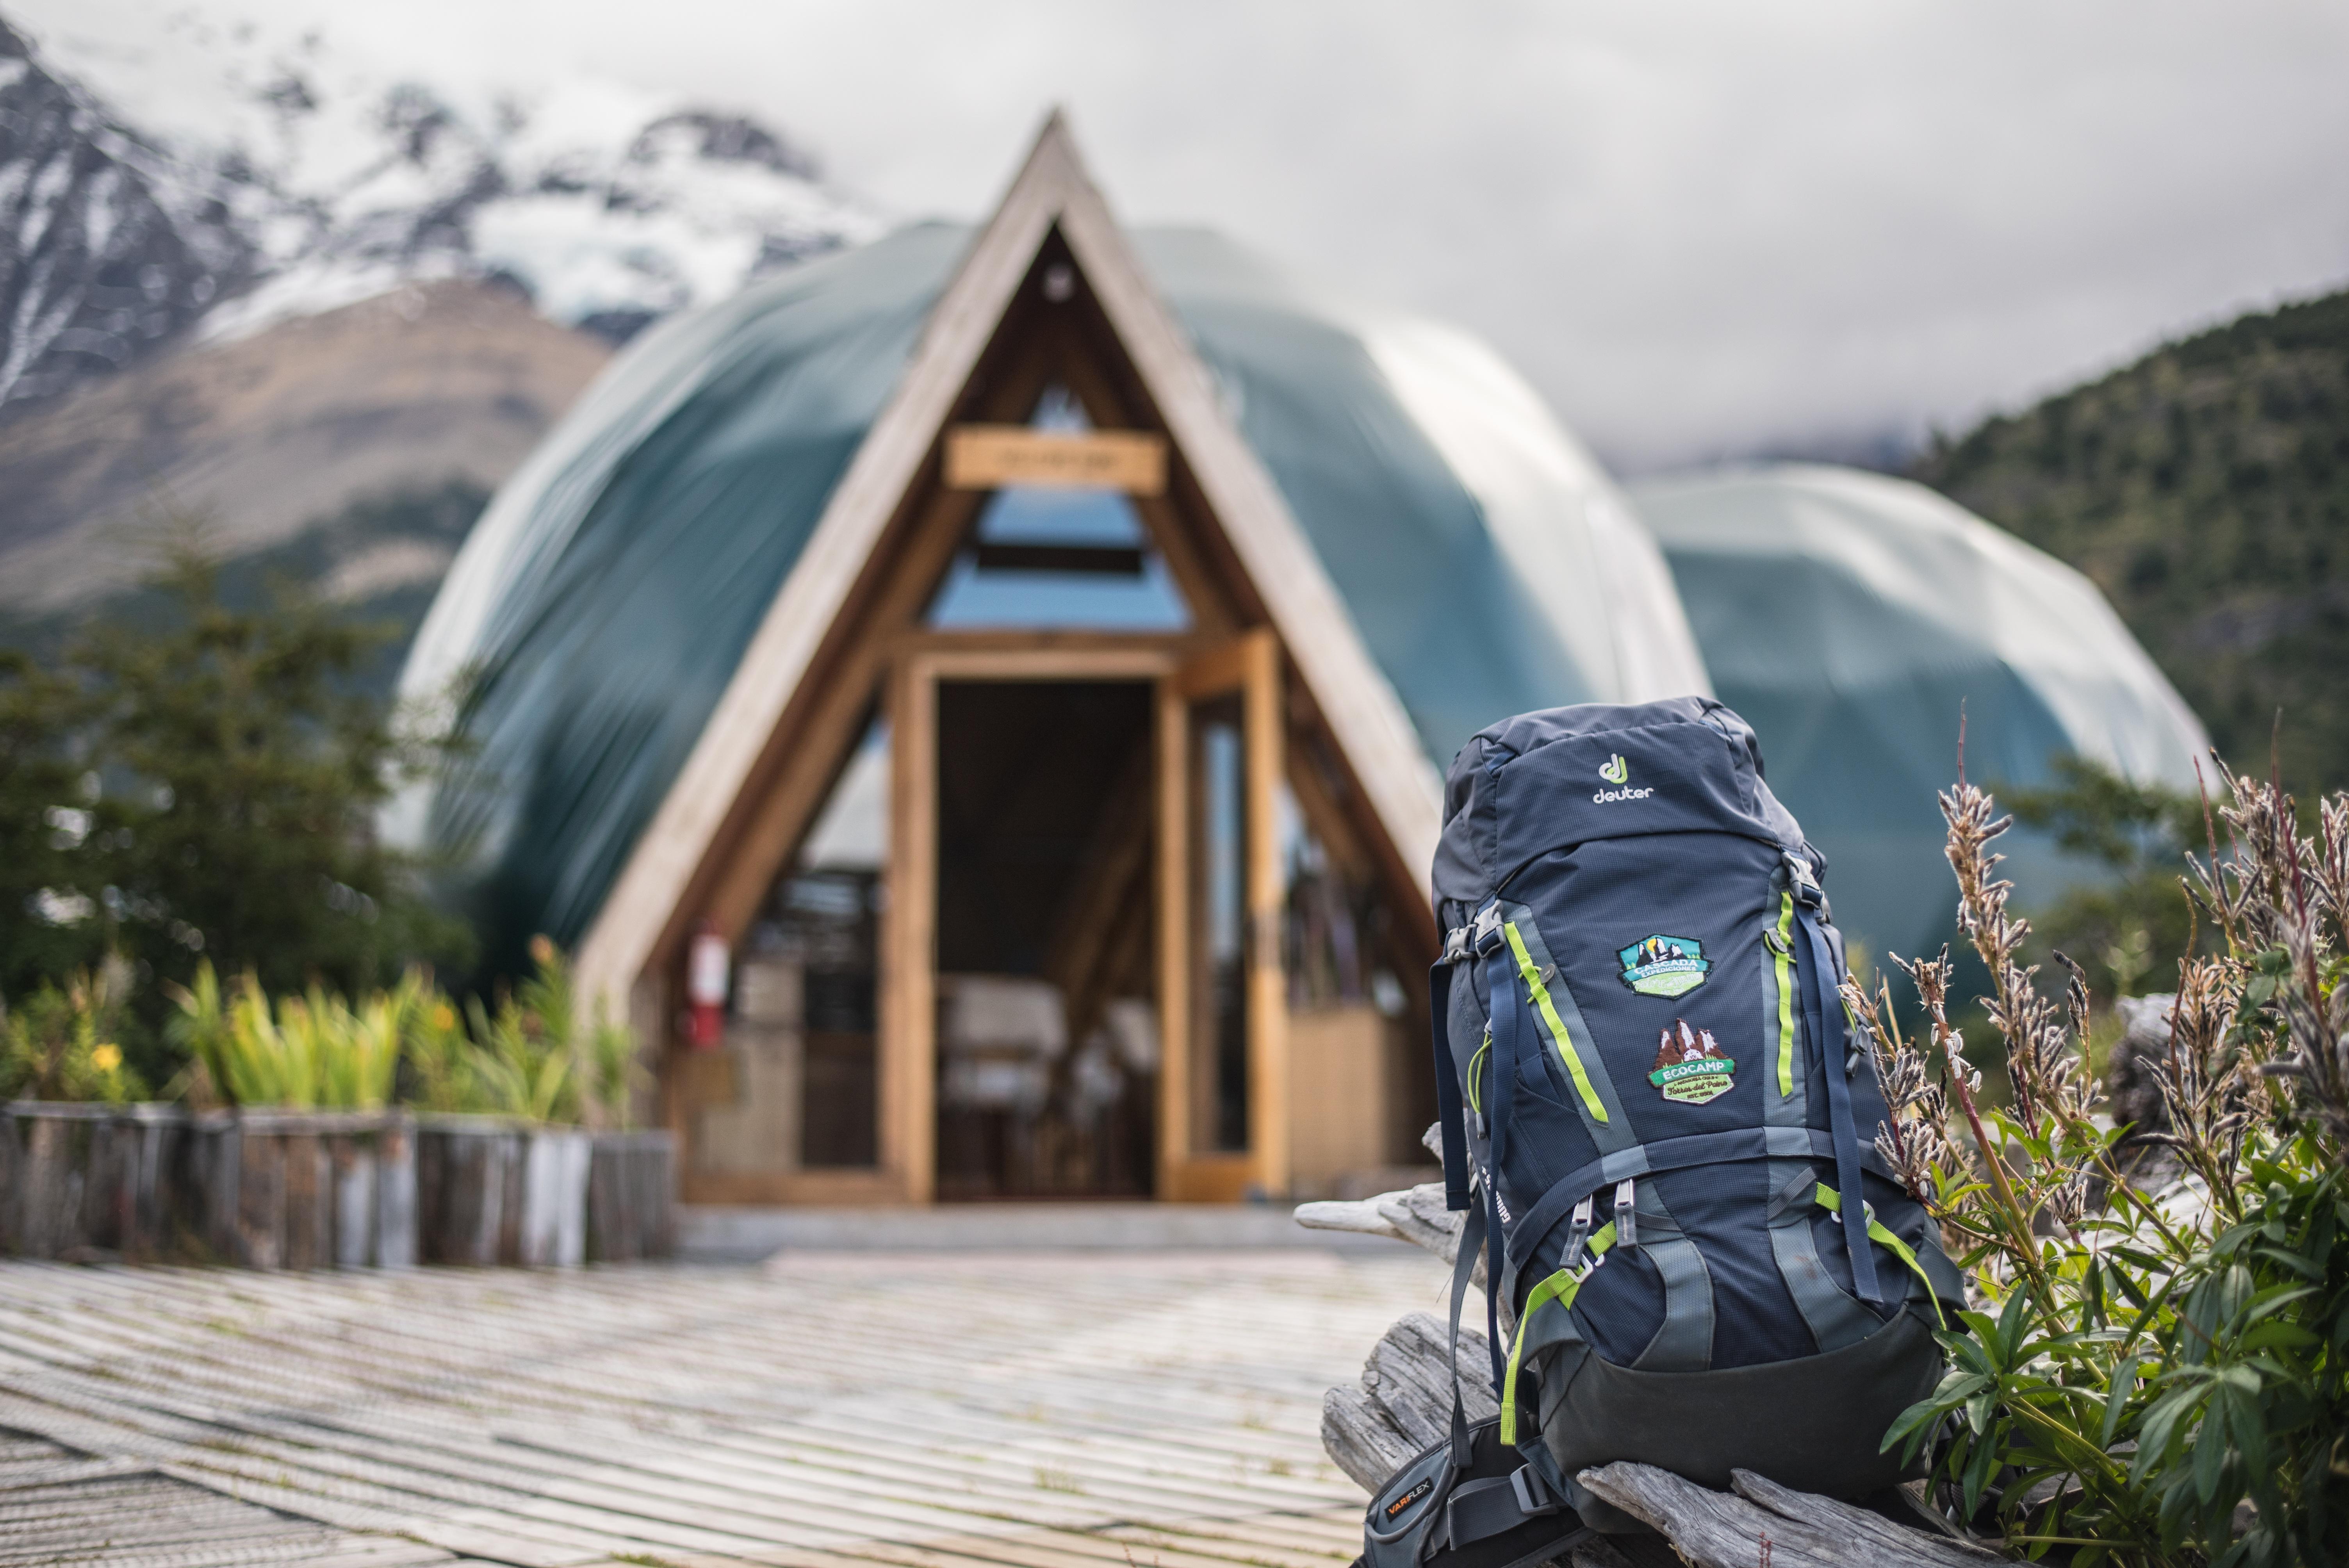 deuter-backpacks-at-ecocamp-patagonia-torres-del-paine-chile_26940663678_o